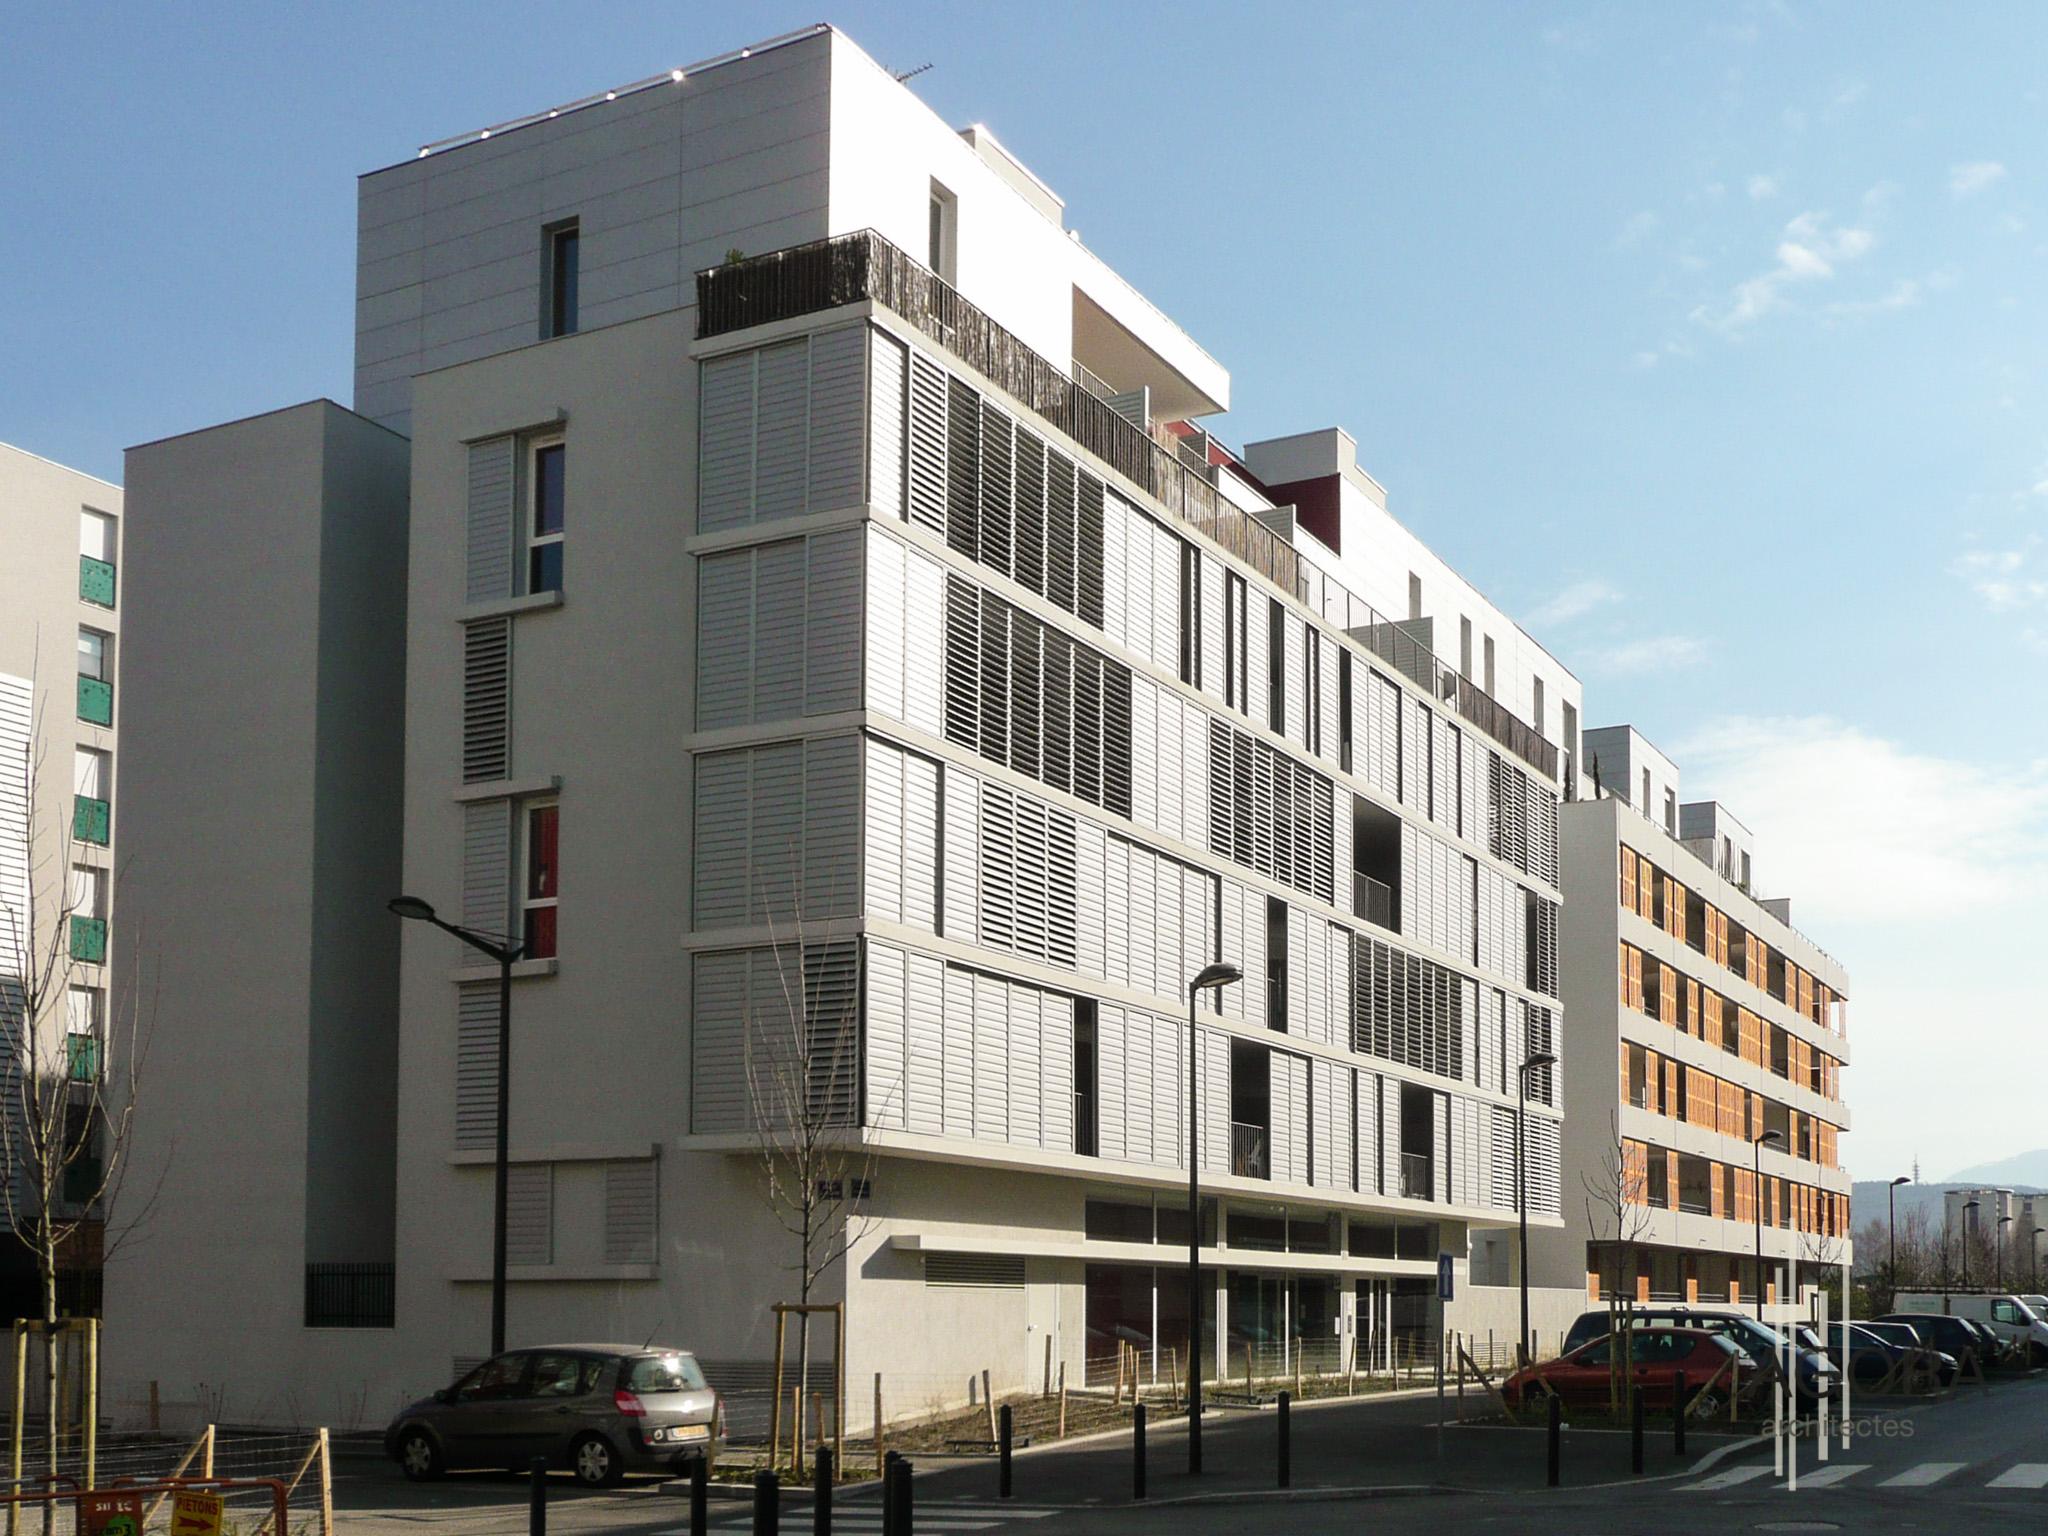 les terrasses des sylphides 31 logements grenoble 38 agora architectes grenoble. Black Bedroom Furniture Sets. Home Design Ideas